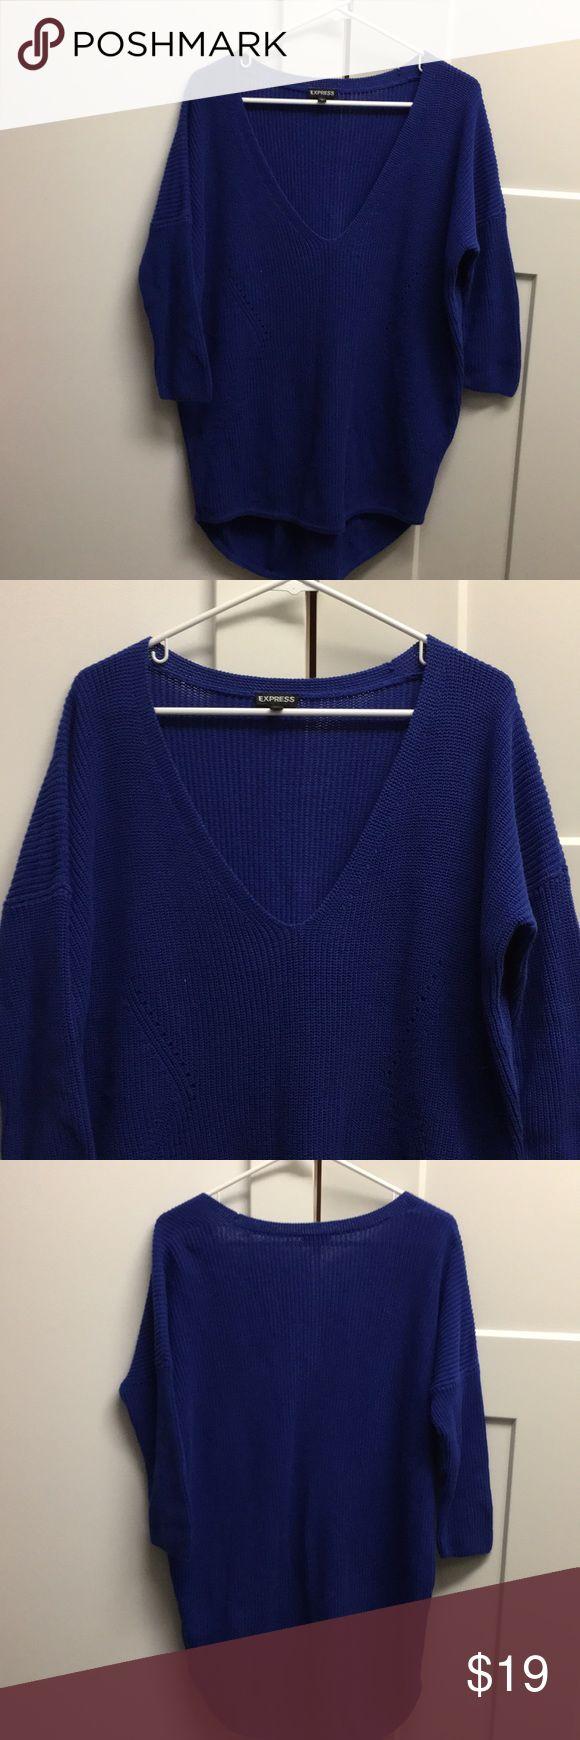 Best 25  Royal blue sweater ideas on Pinterest | Patagonia jacket ...